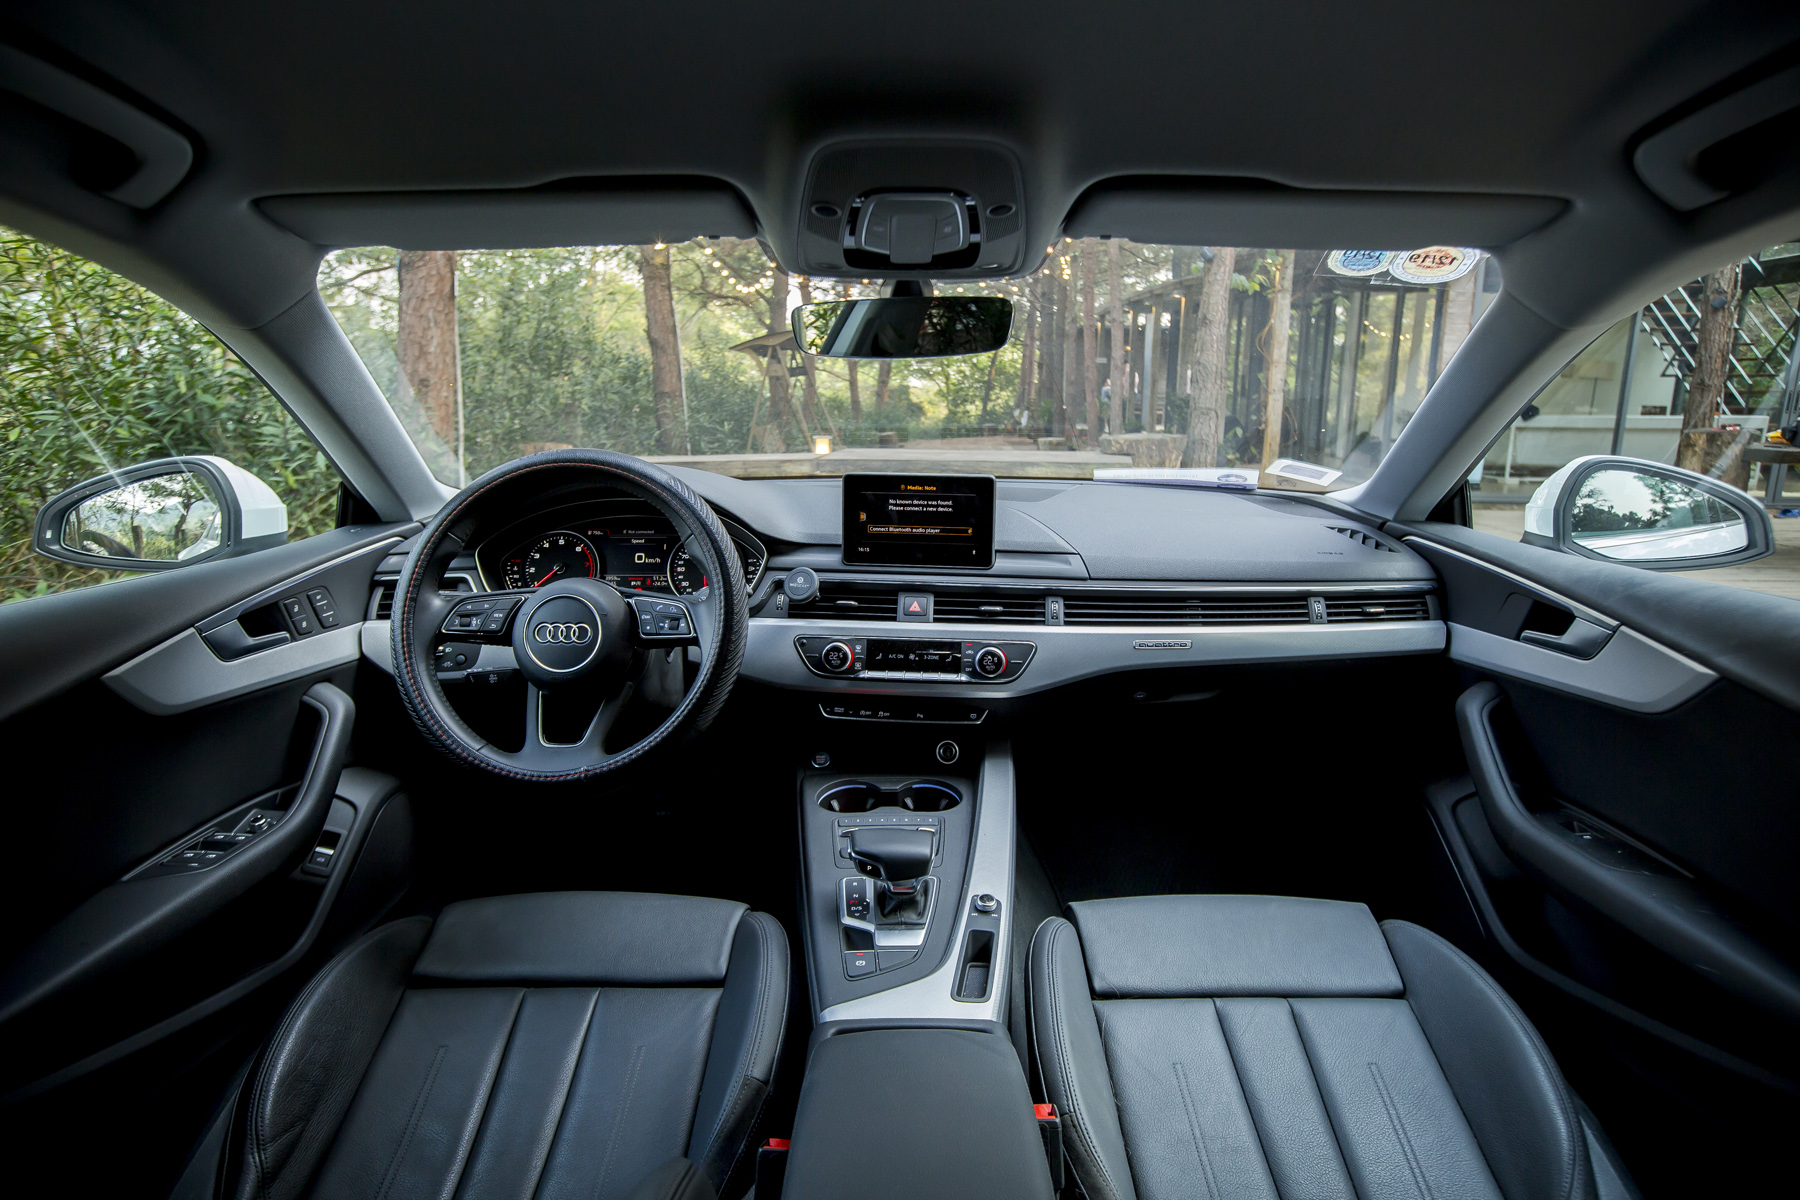 Audi-A5-Sportback-moi-tai-Viet-Nam-An-xang-it-hon-ma-manh-hon-anh-4